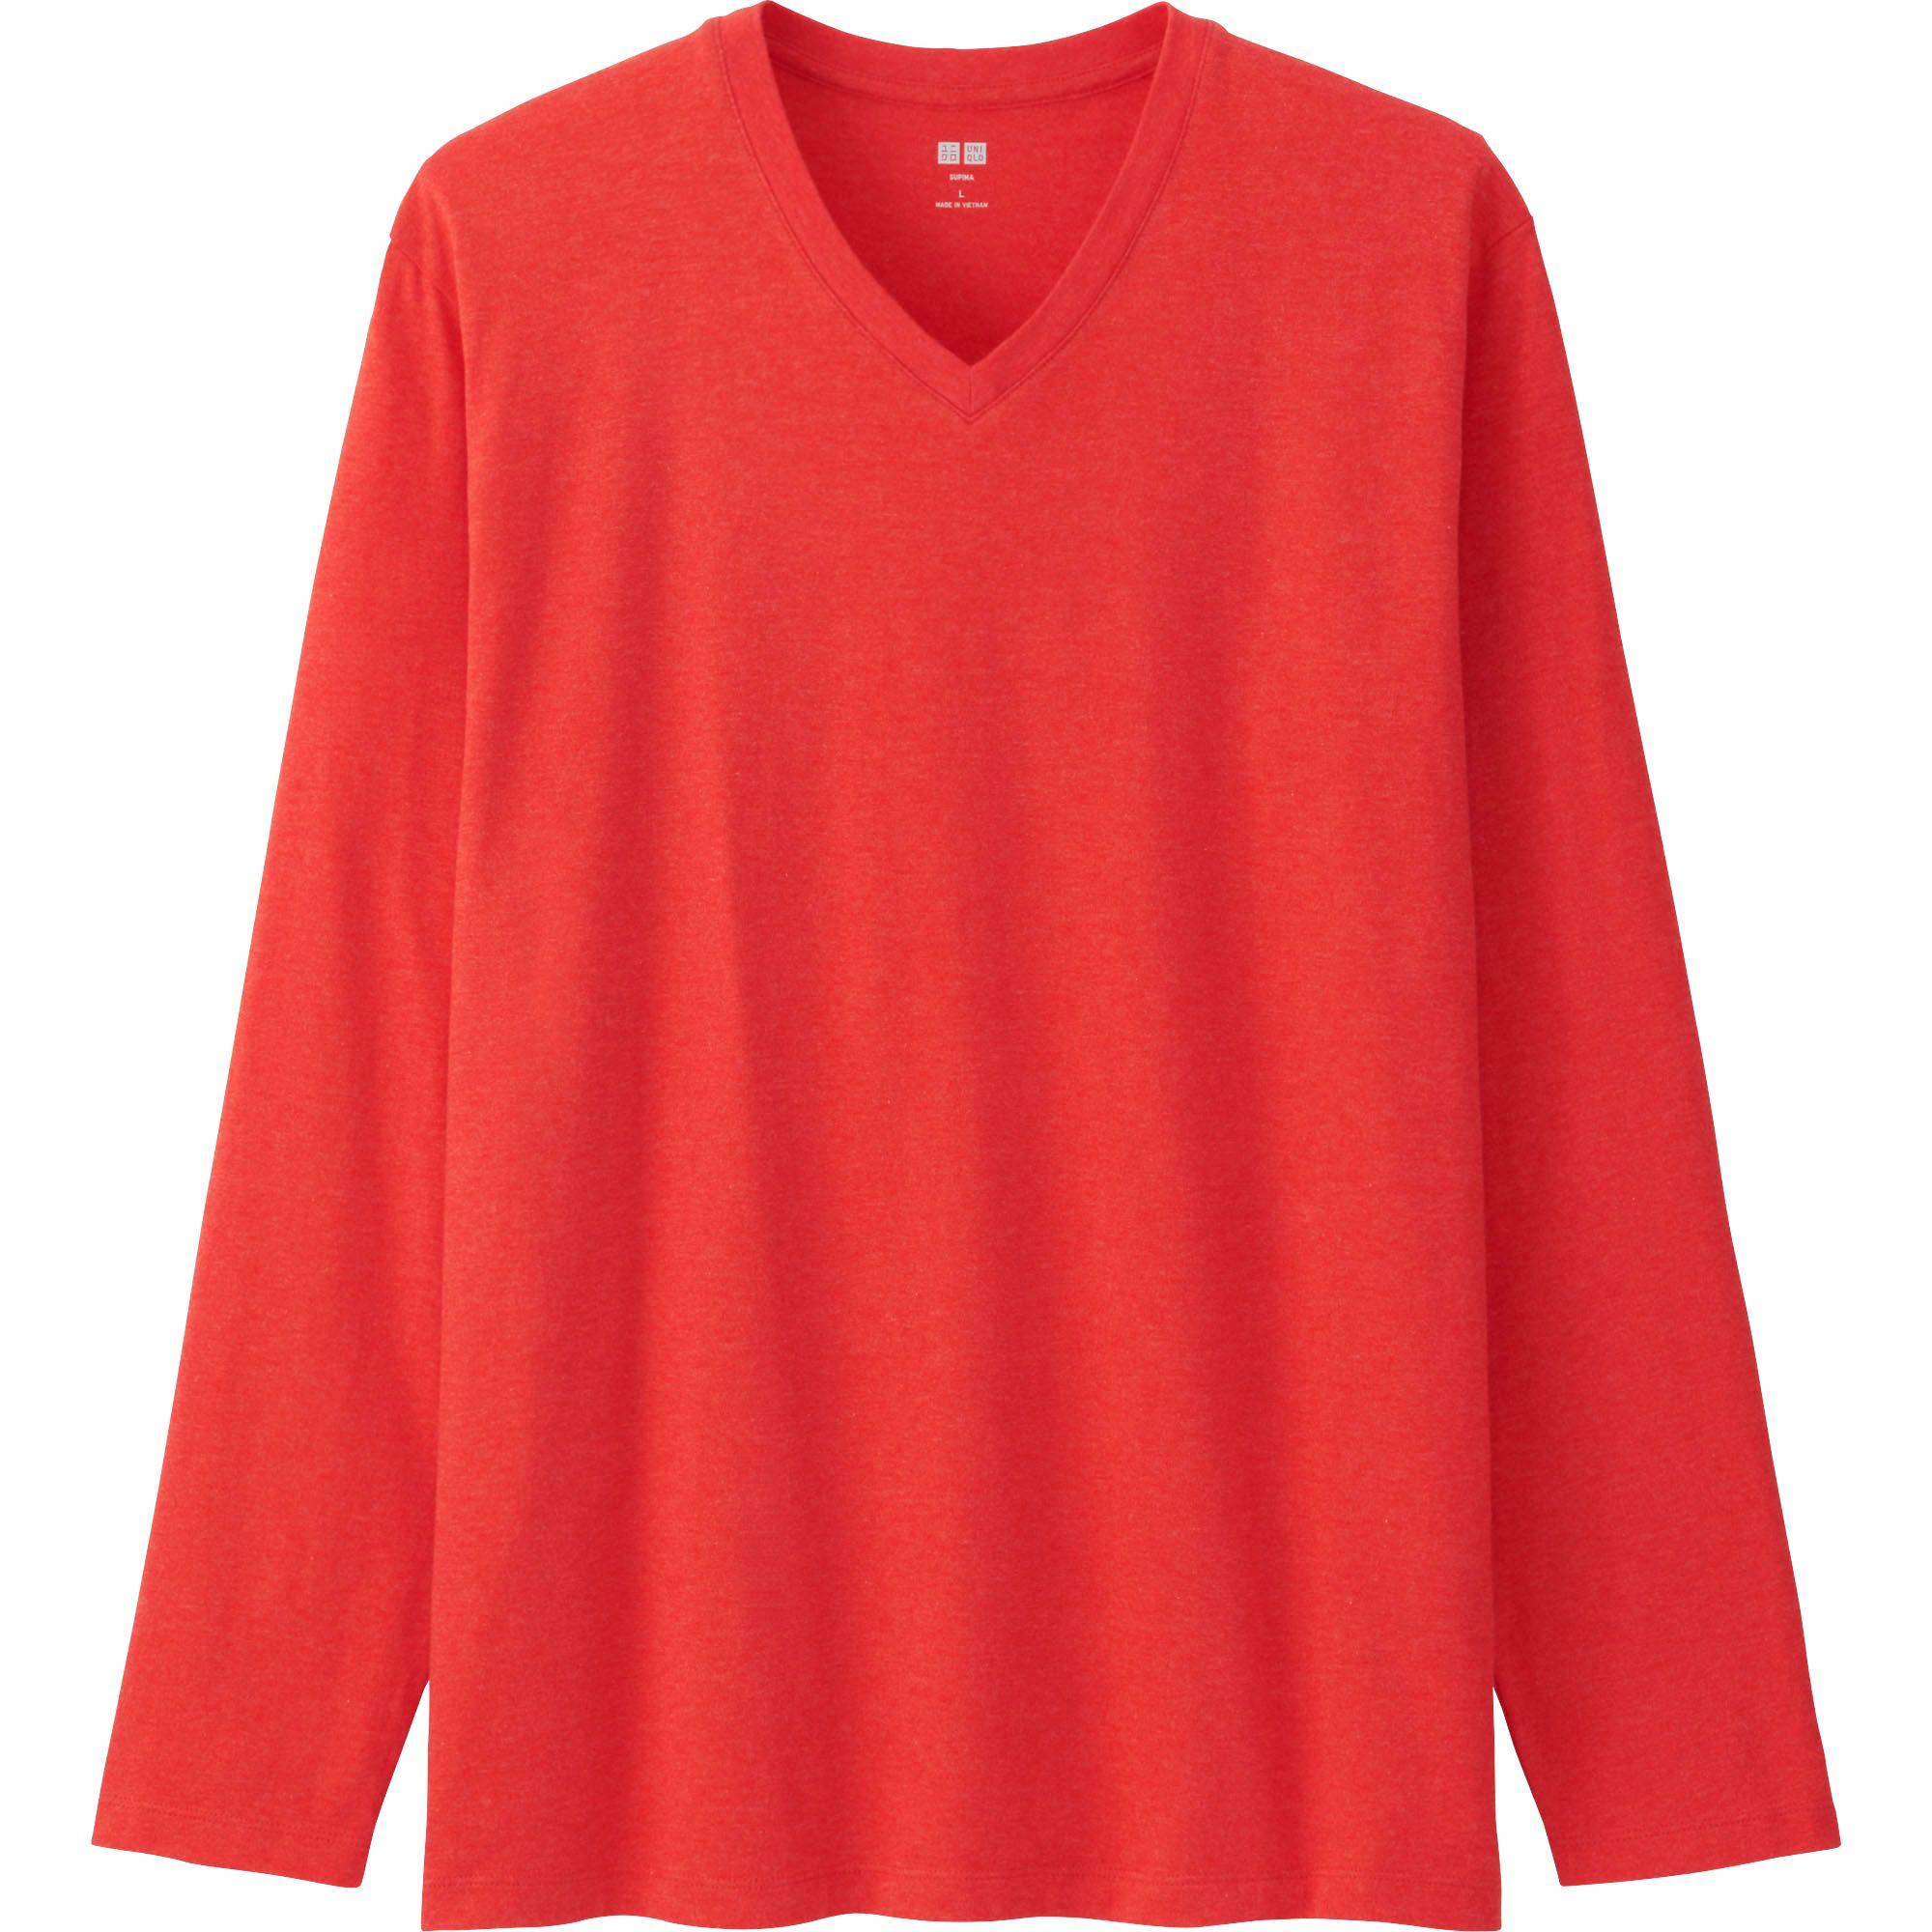 Uniqlo men supima cotton v neck long sleeve t shirt in red for Cotton long sleeve v neck t shirts